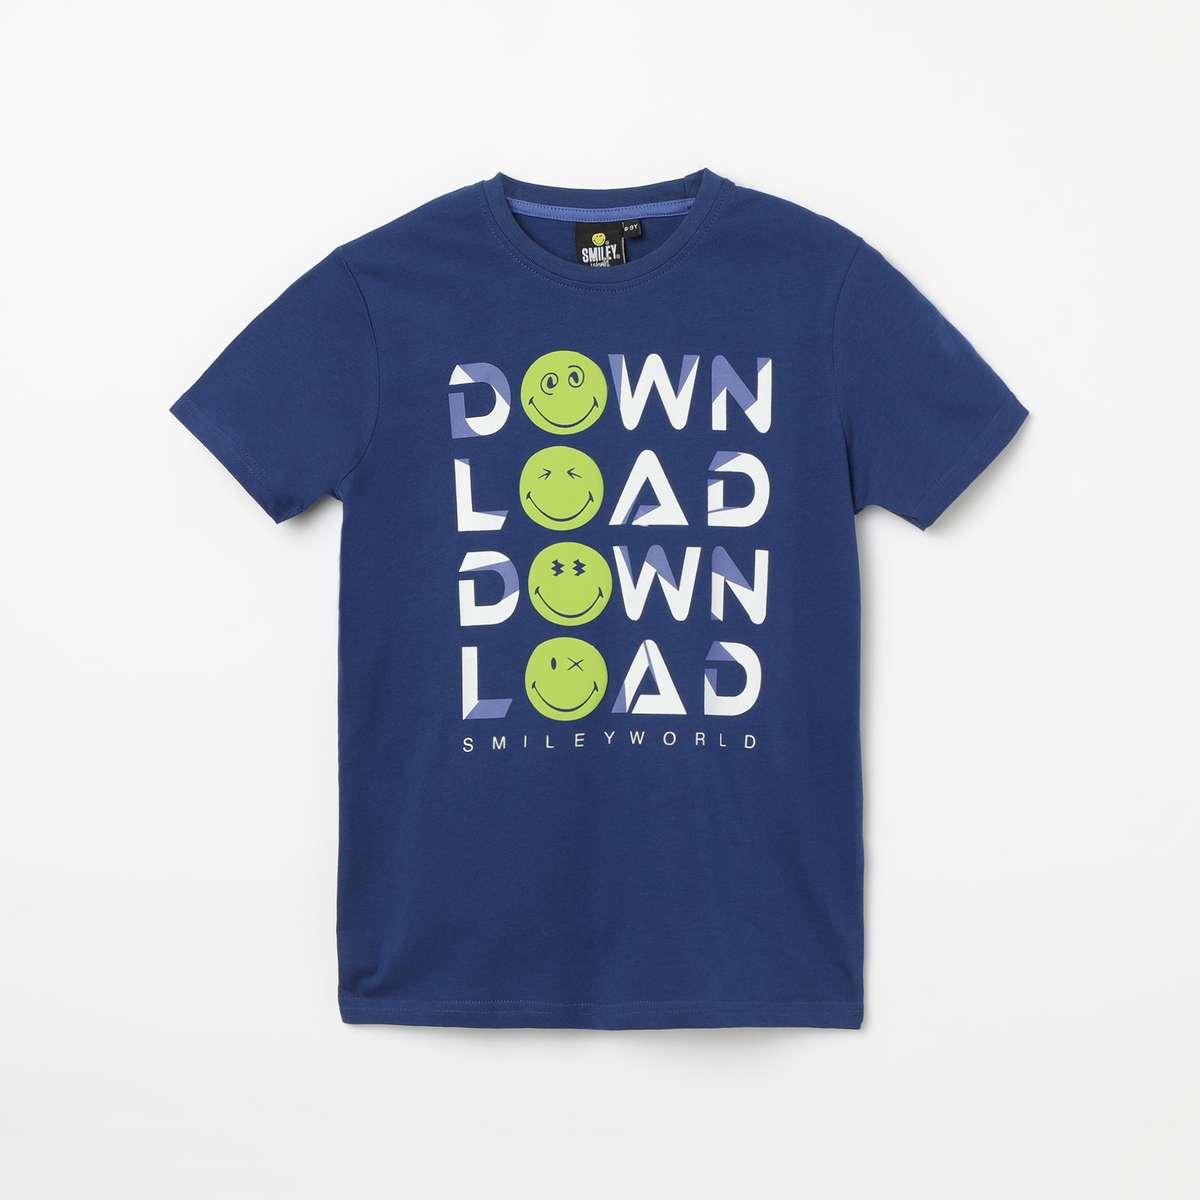 1b. SMILEYWORLD Printed Crew Neck T-shirt